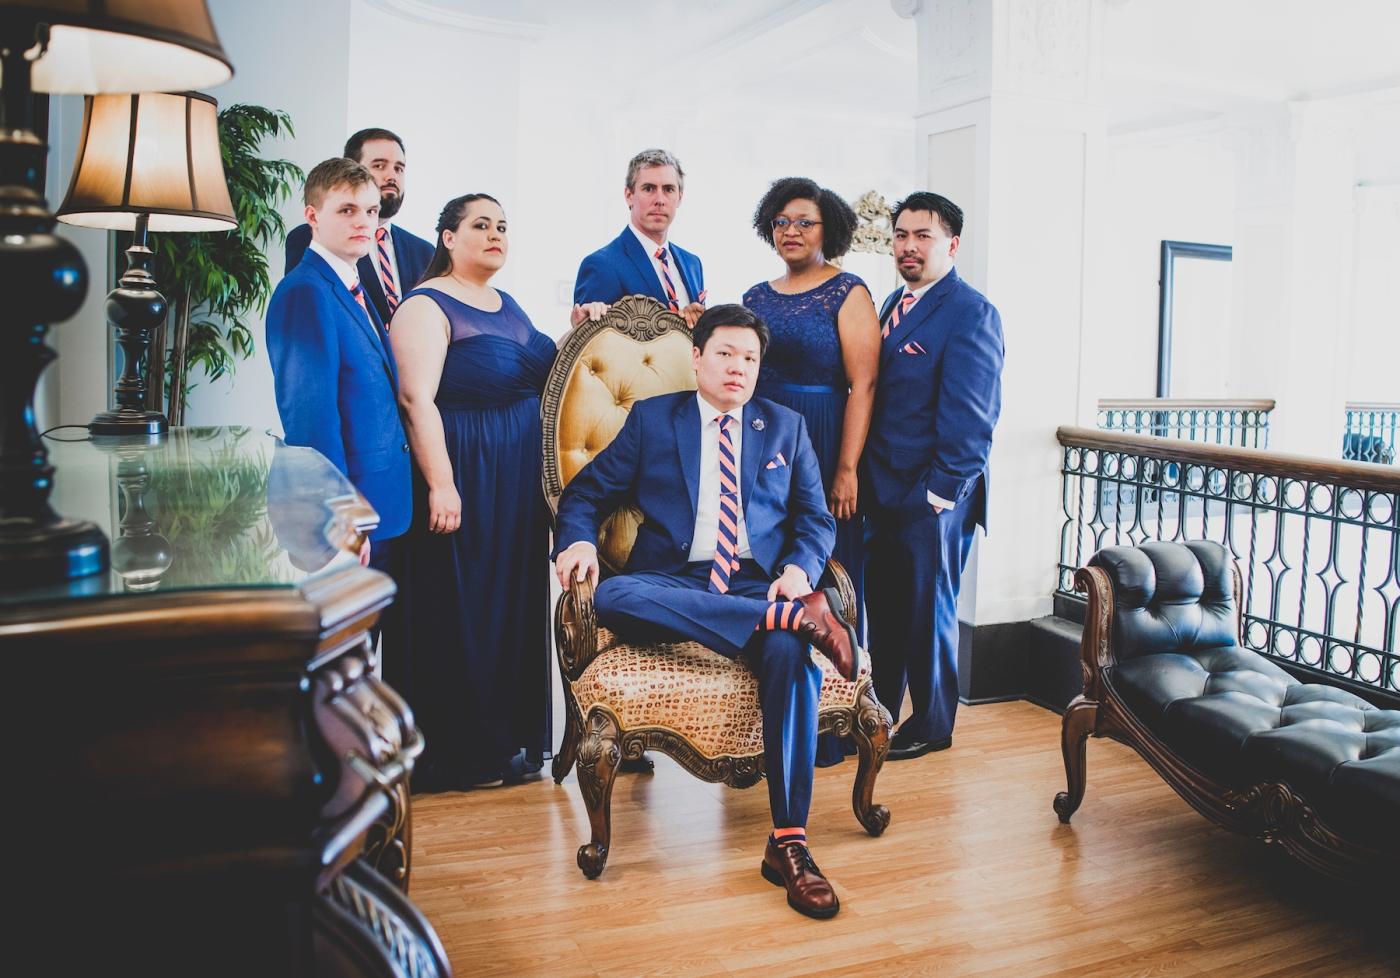 DSC_1973Everett_Wedding_Ballroom_Jane_Speleers_photography_Rachel_and_Edmund_Getting_ready_2017